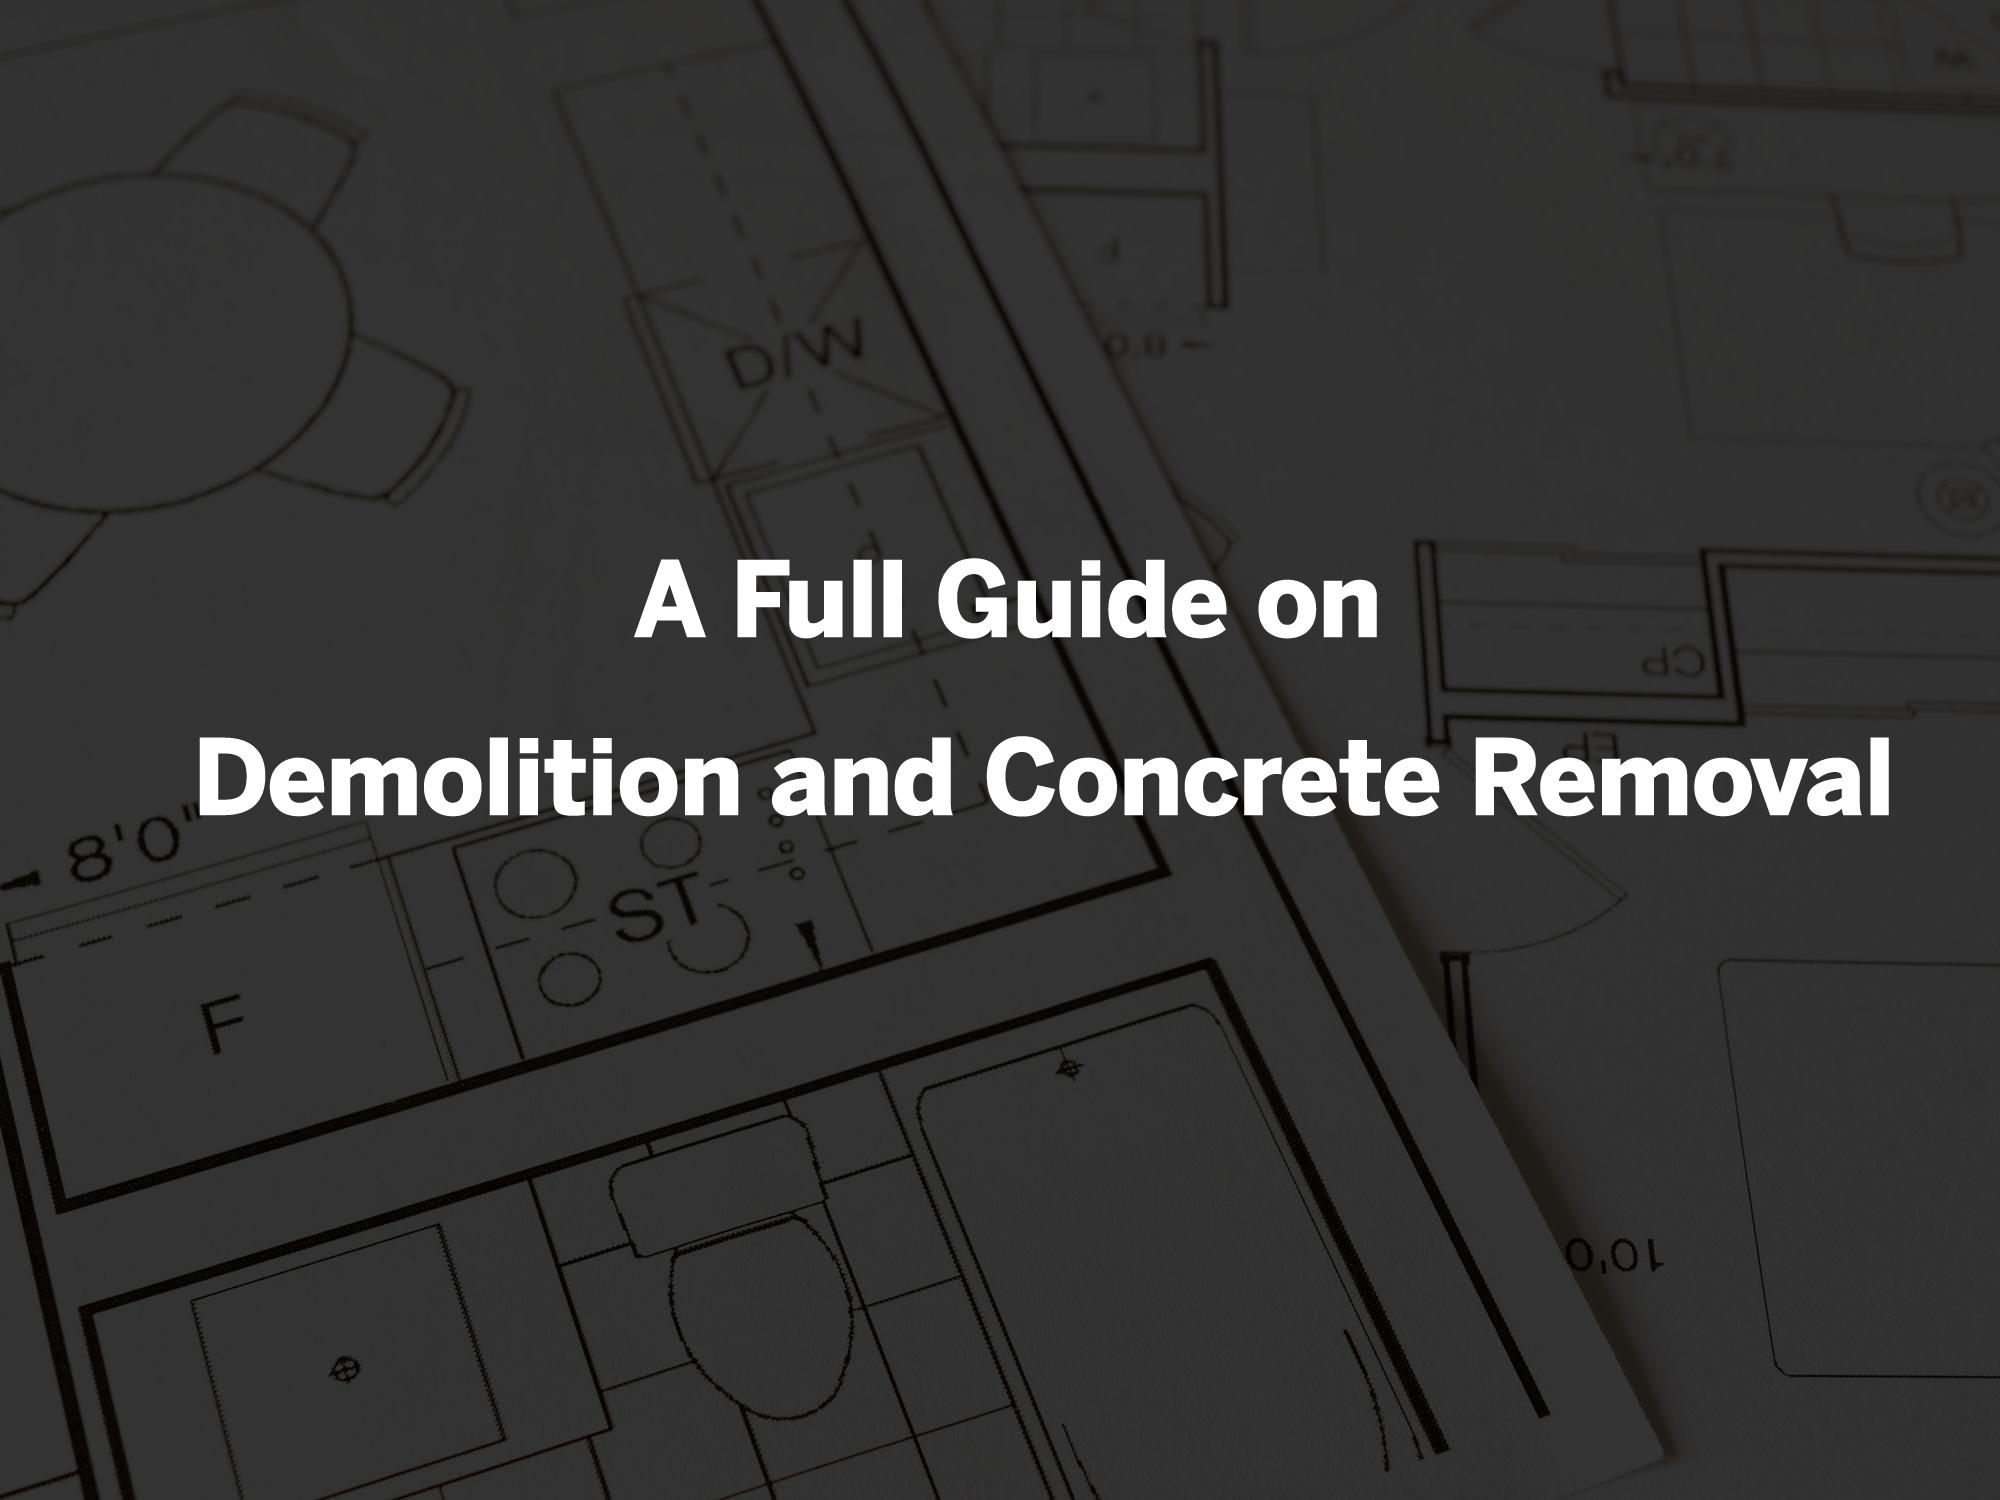 demolition services and concrete removal guide rks services group windsor